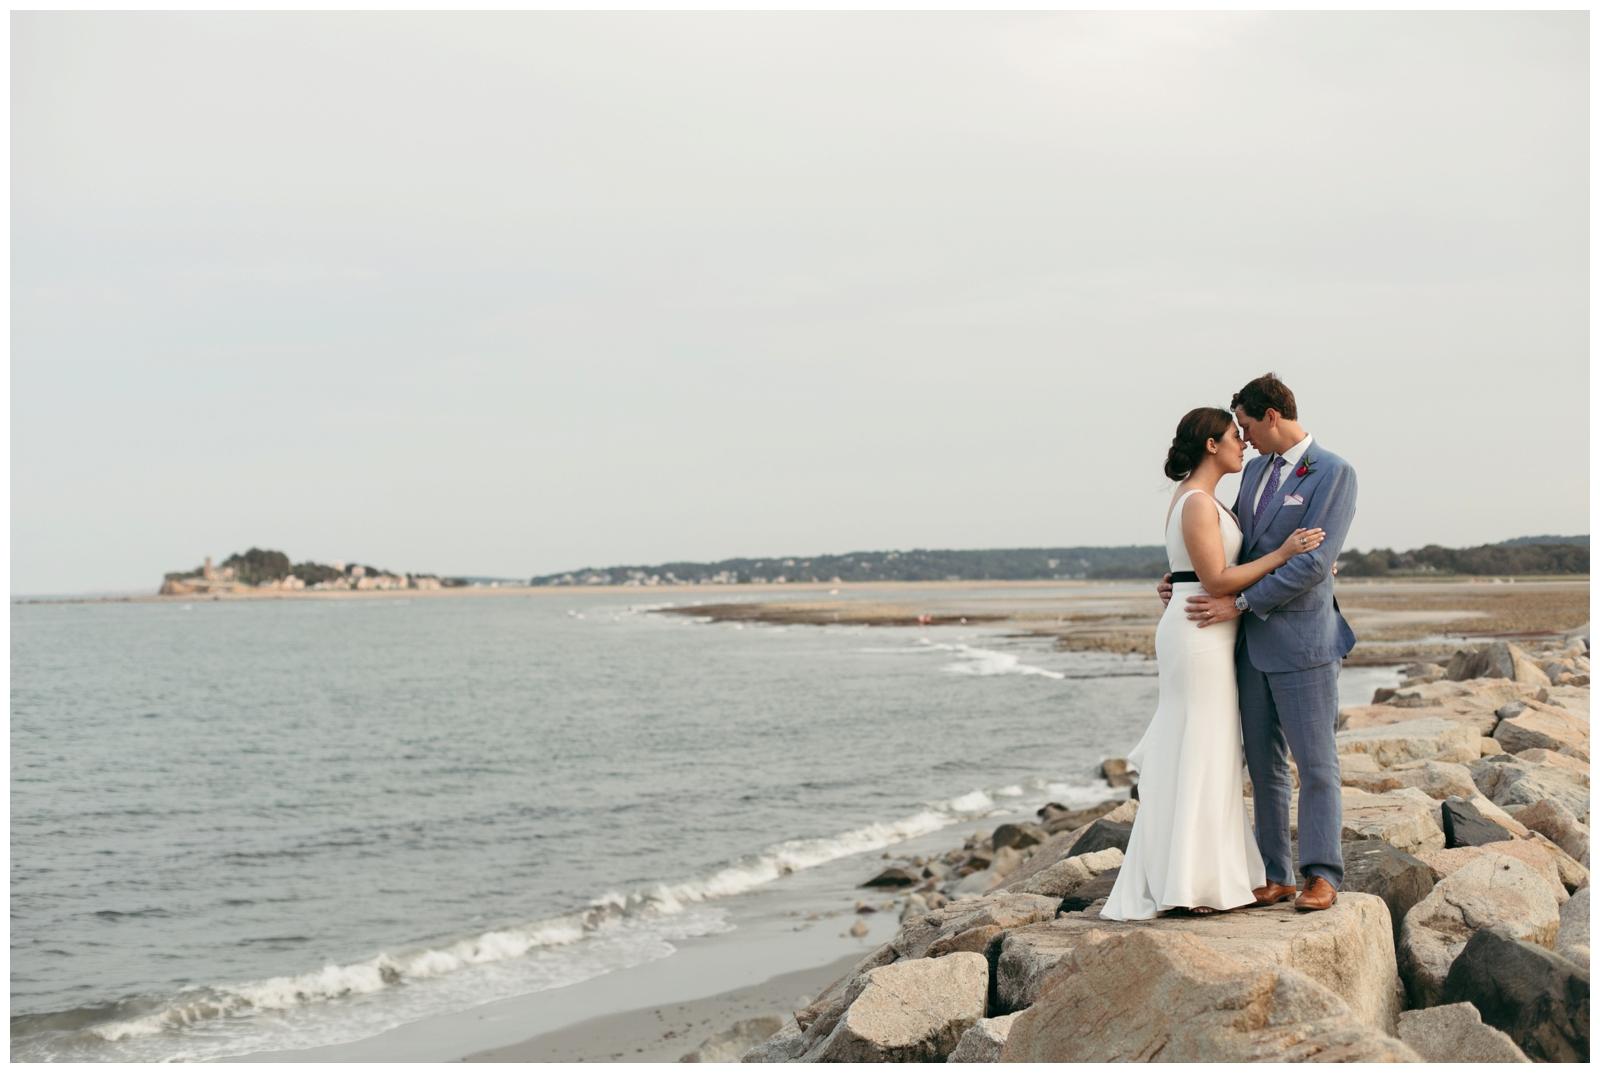 Bailey-Q-Photo-Backyard-Wedding-South-Shore-Boston-Wedding-Photographer-001.jpg